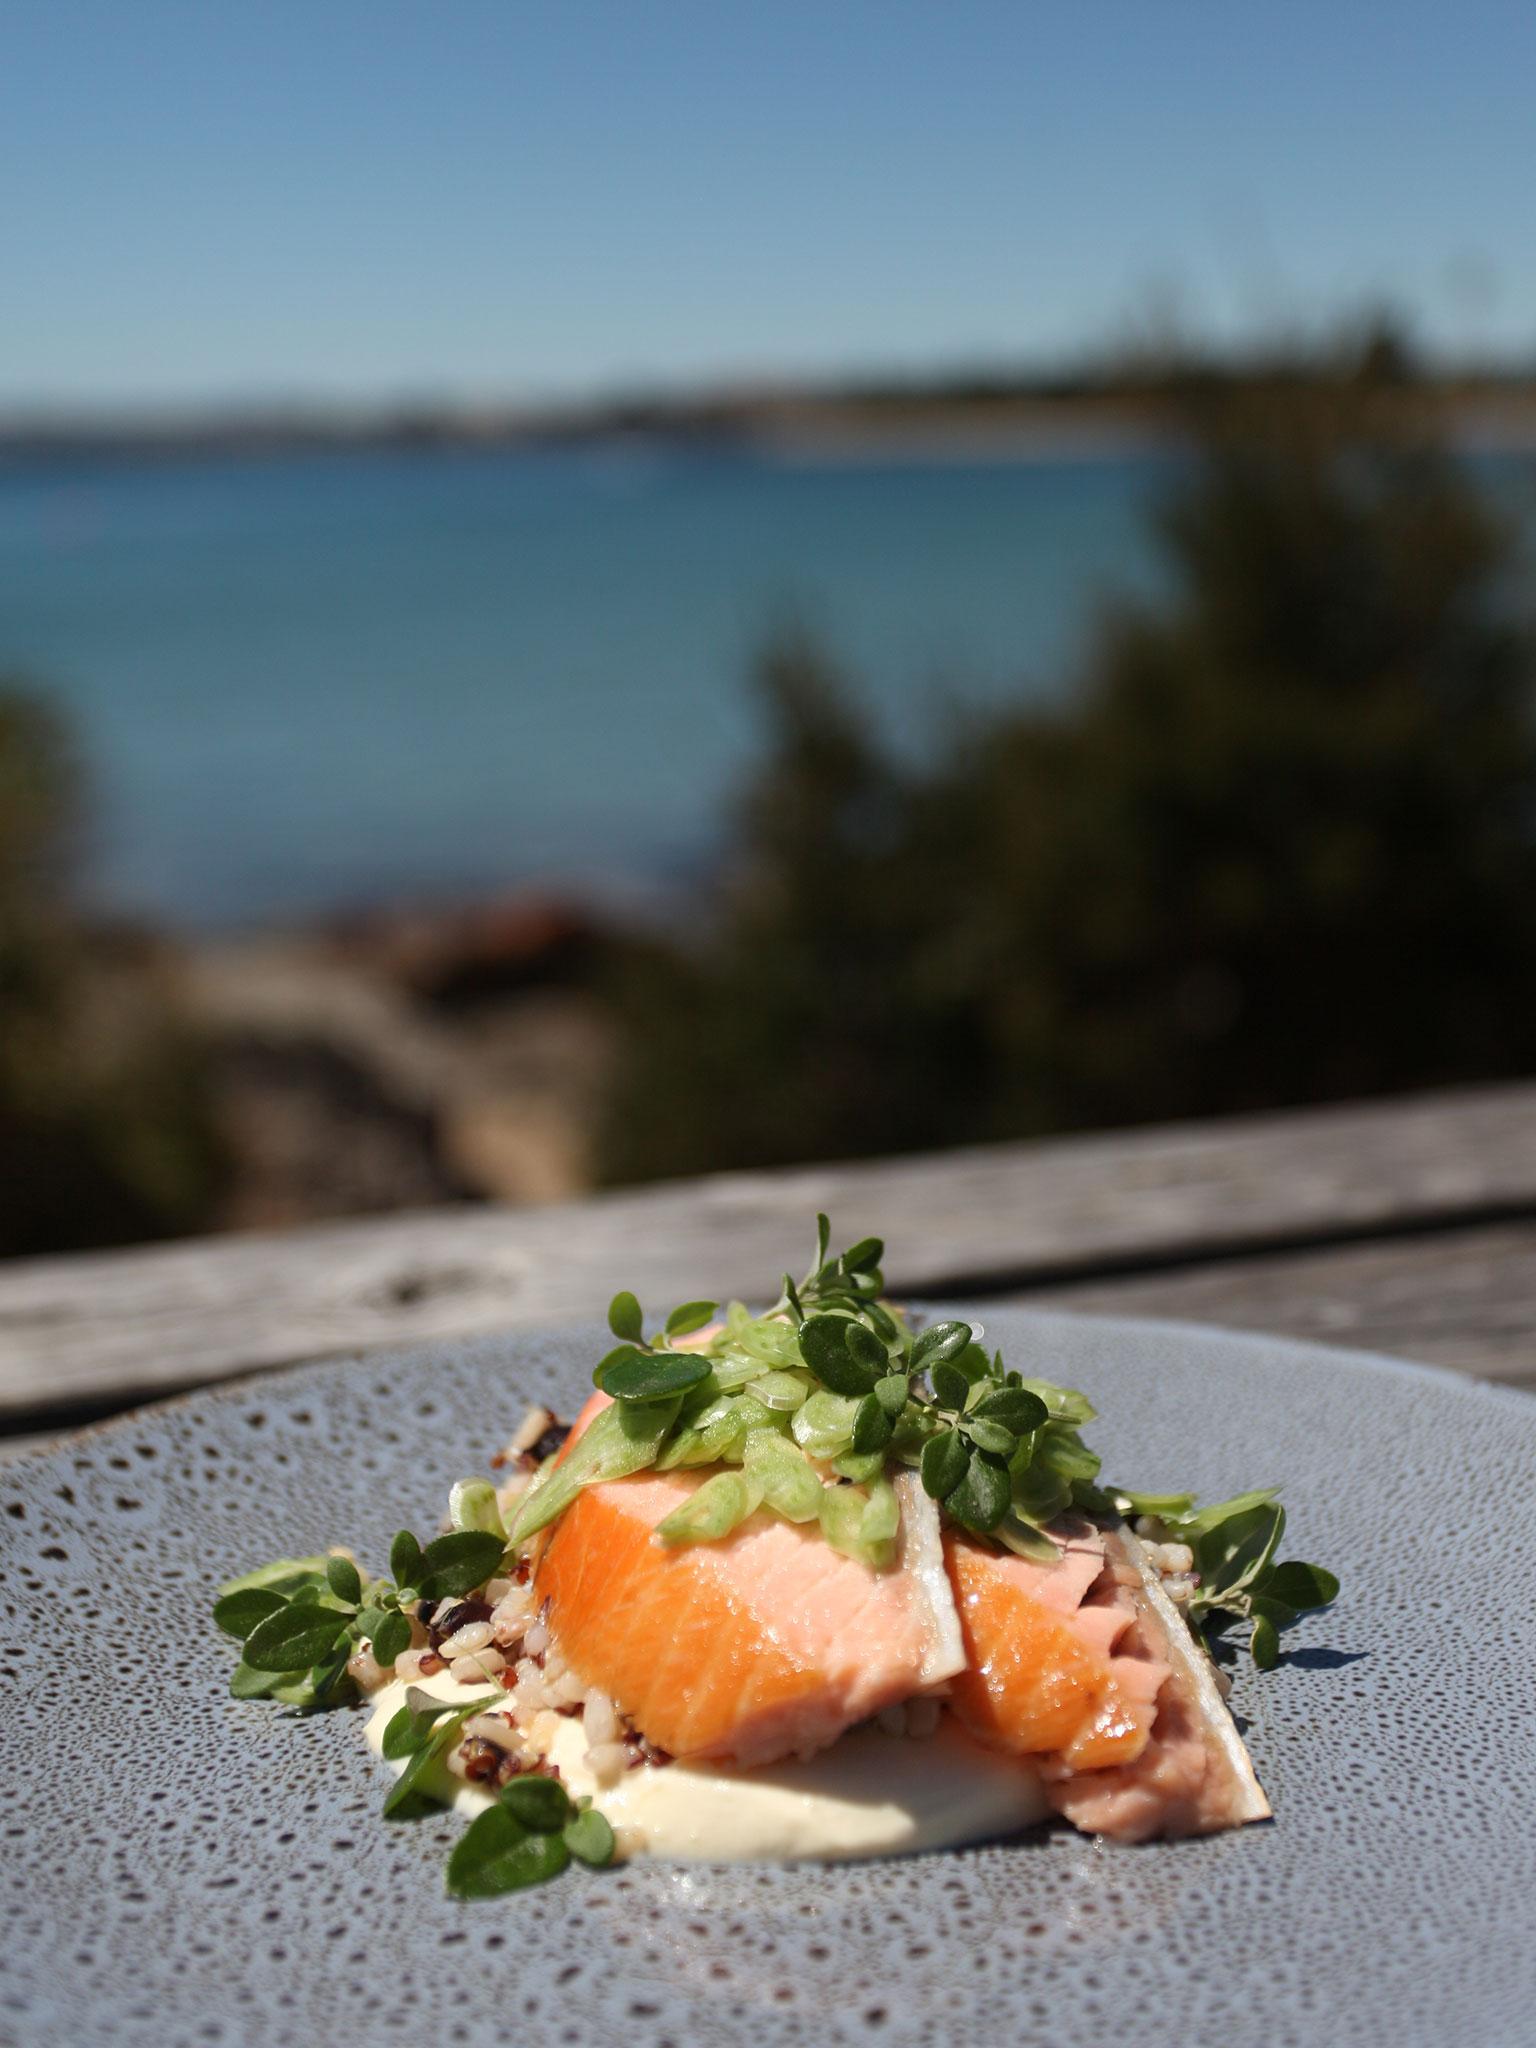 2-210-Pickled-Wasabi-Stalks-and-Wood-Roasted-Salmon-web.jpg